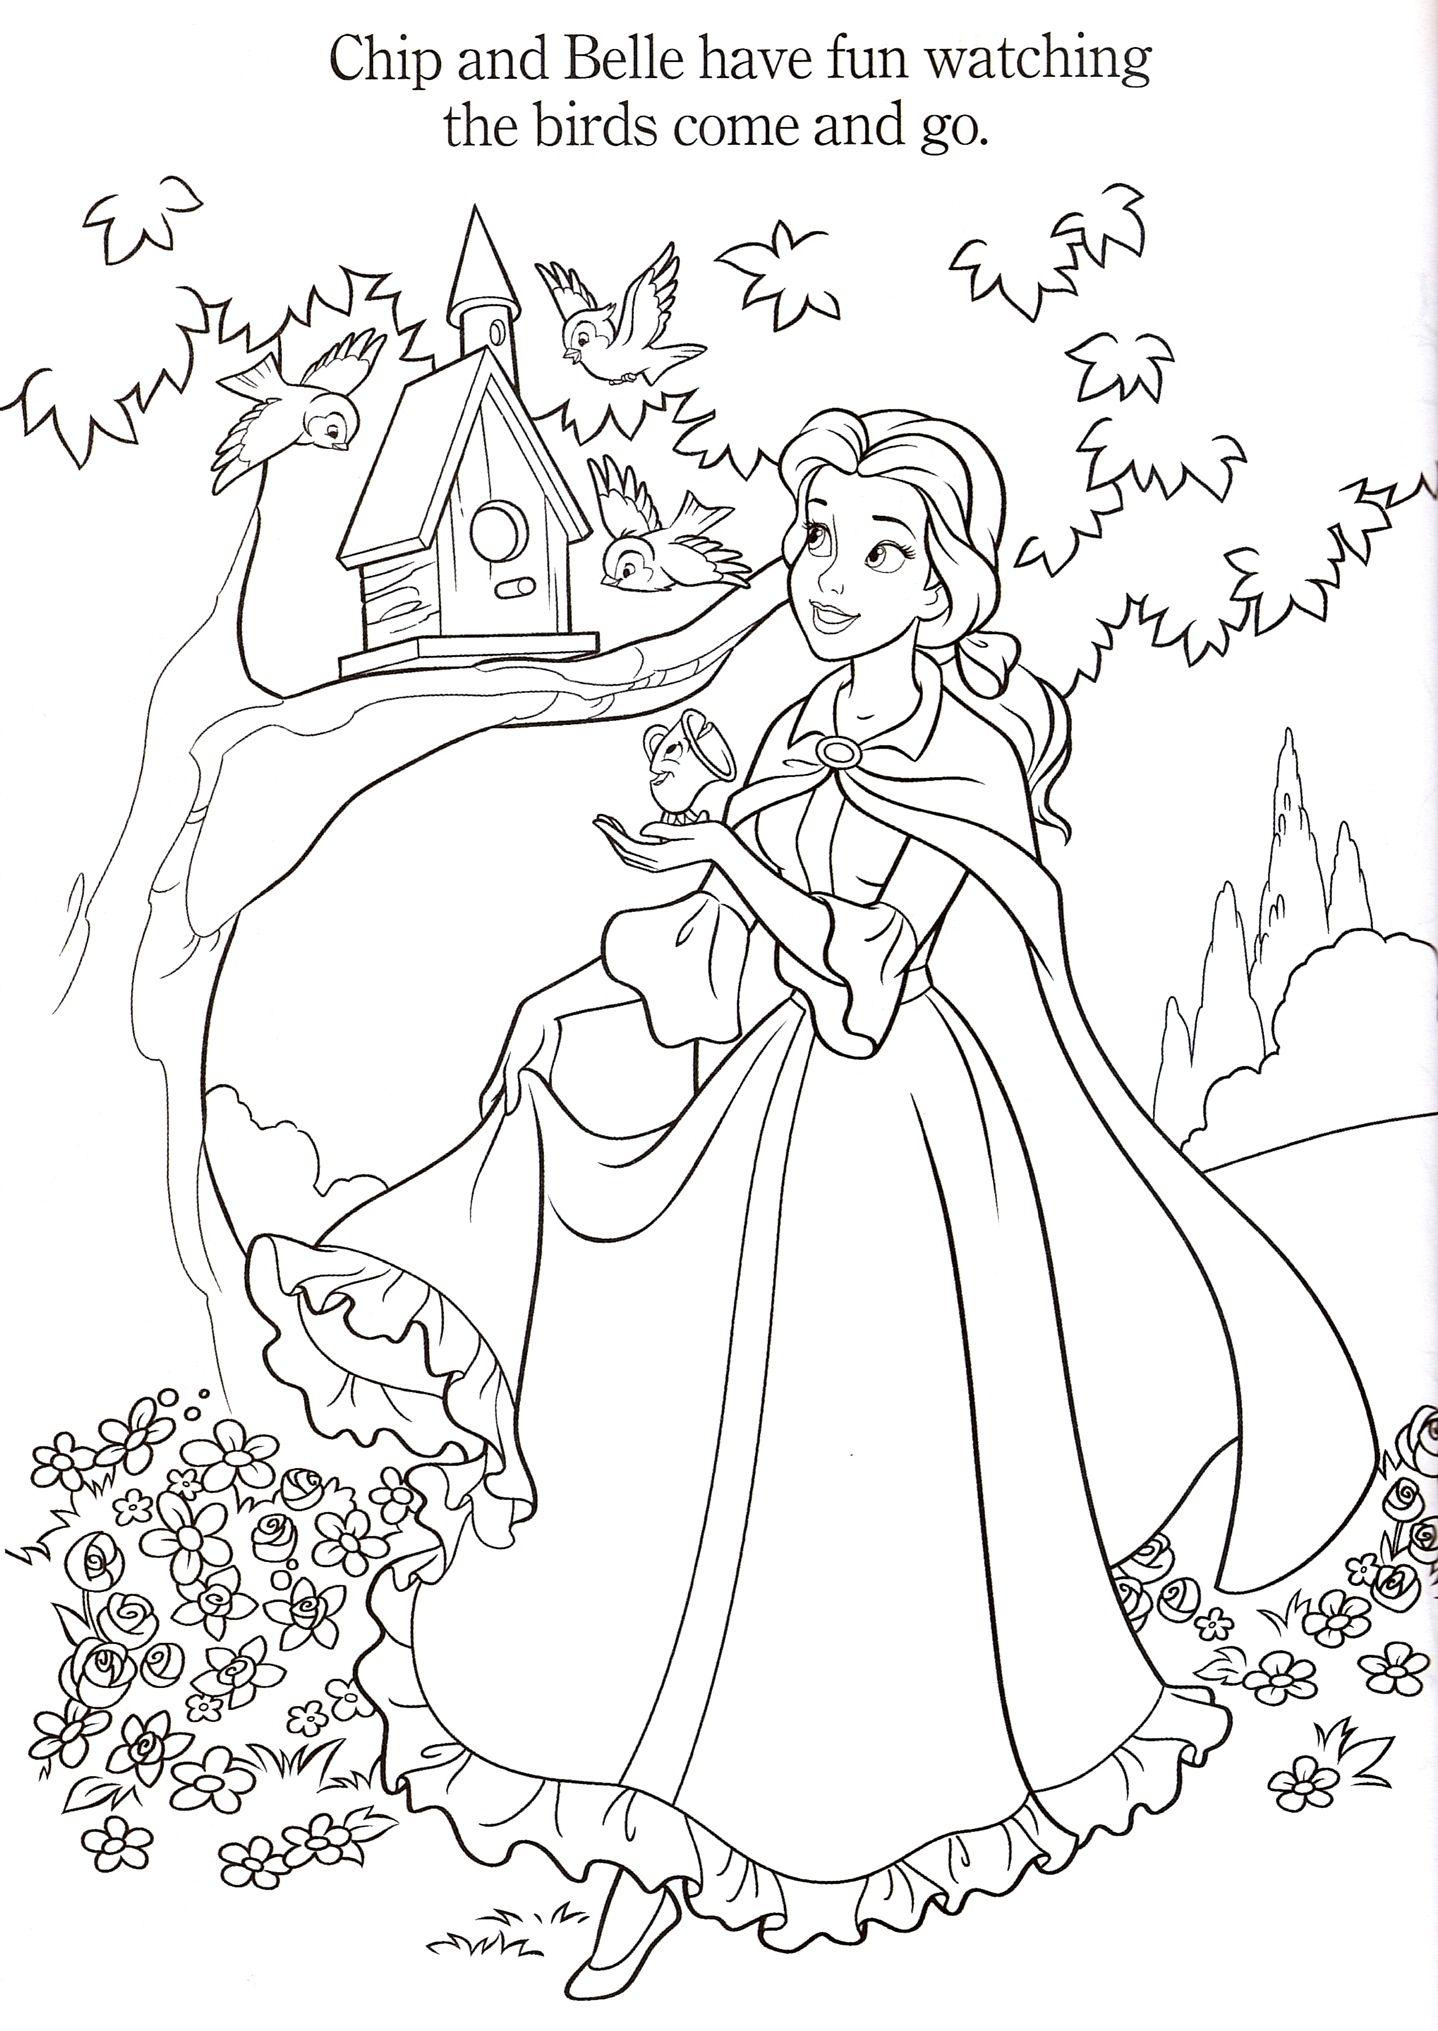 Http Www Oasidelleanime Com Minisiti Colorare Disney Princess Original9 Principe Disney Princess Coloring Pages Princess Coloring Pages Disney Coloring Pages